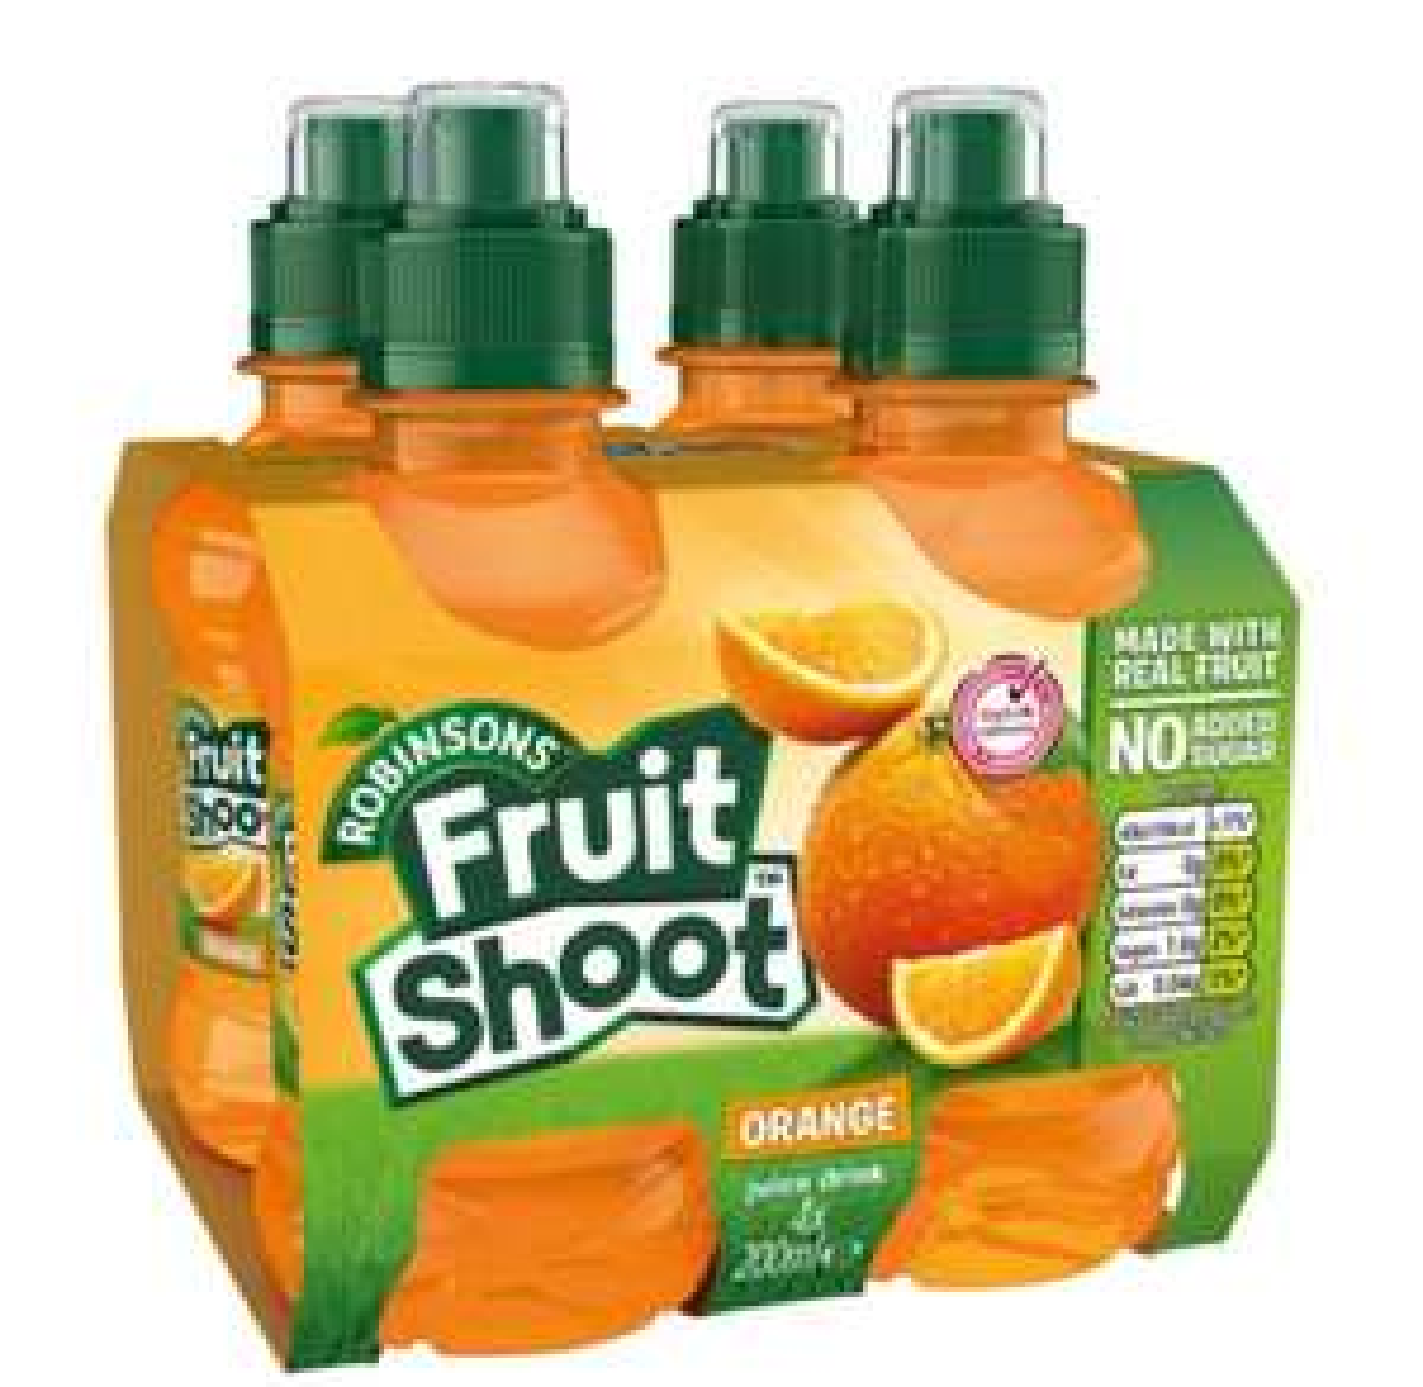 Fruit Shoots X 4 £0.90p - Orange/Summer Fruits/Blackcurrant 90p @ Tesco